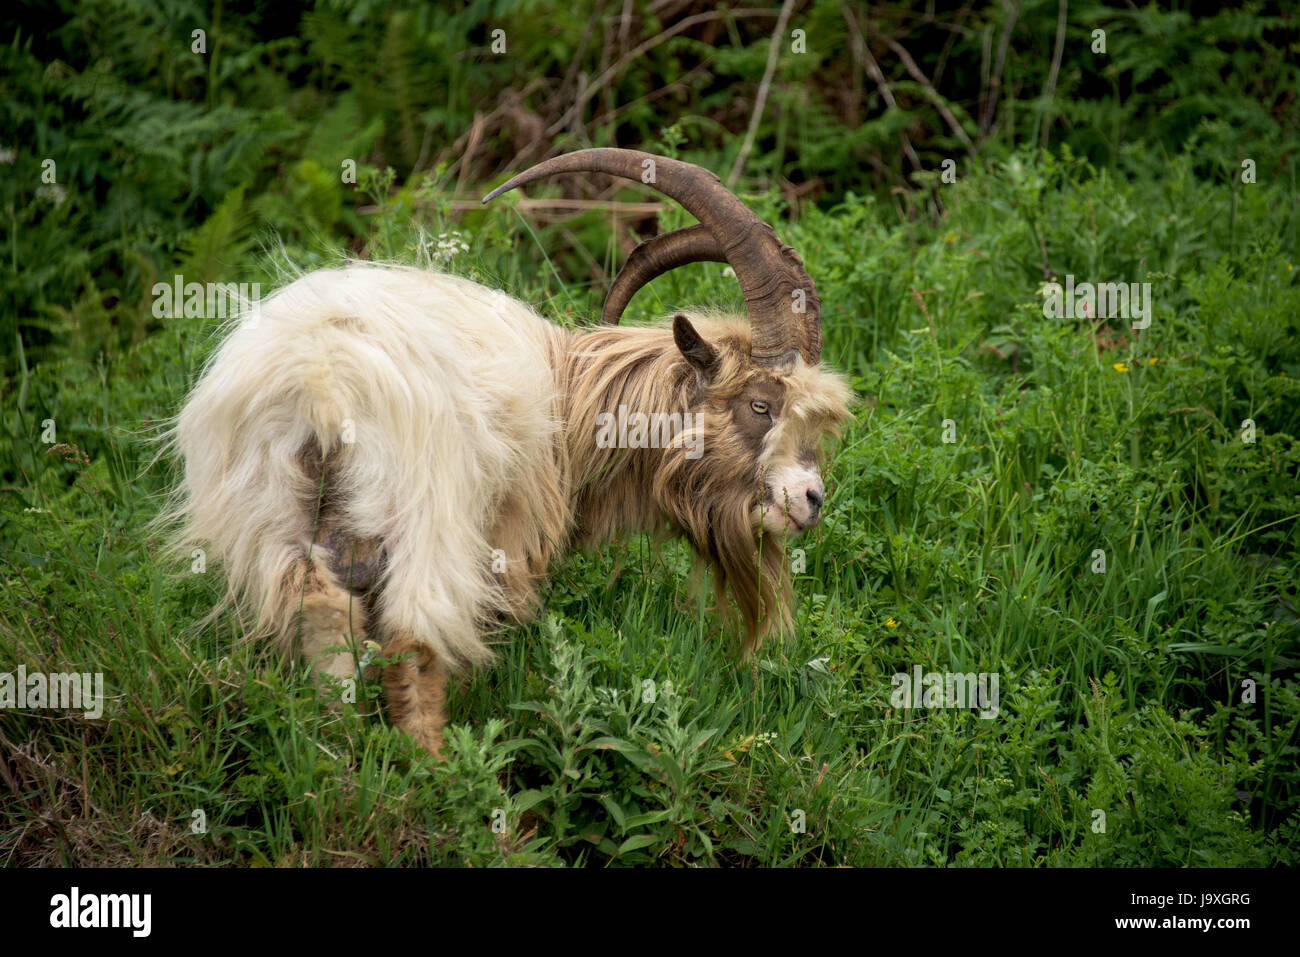 Welsh Mountain Goat on coastal region of North Wales, Snowdonia. - Stock Image